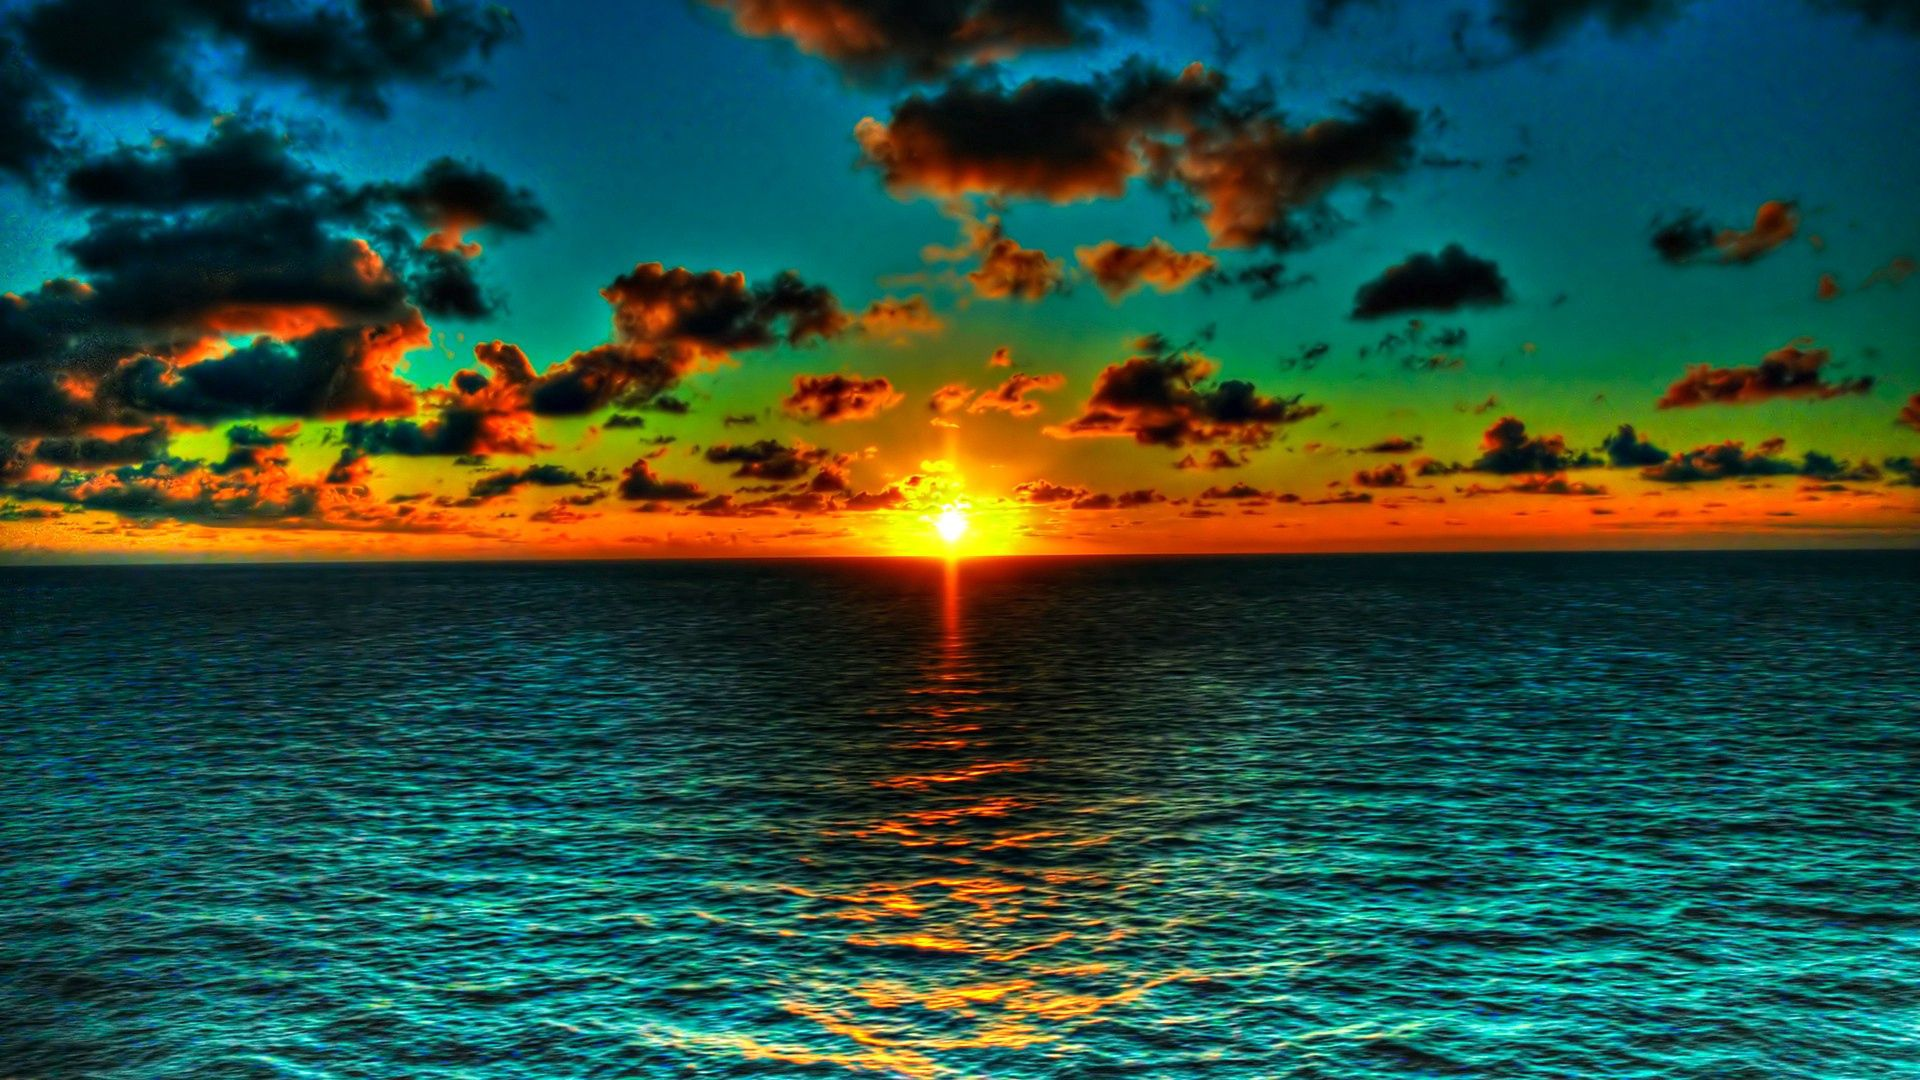 91276 Заставки и Обои Солнце на телефон. Скачать Солнце, Природа, Вода, Море, Облака, Горизонт, Цвета картинки бесплатно